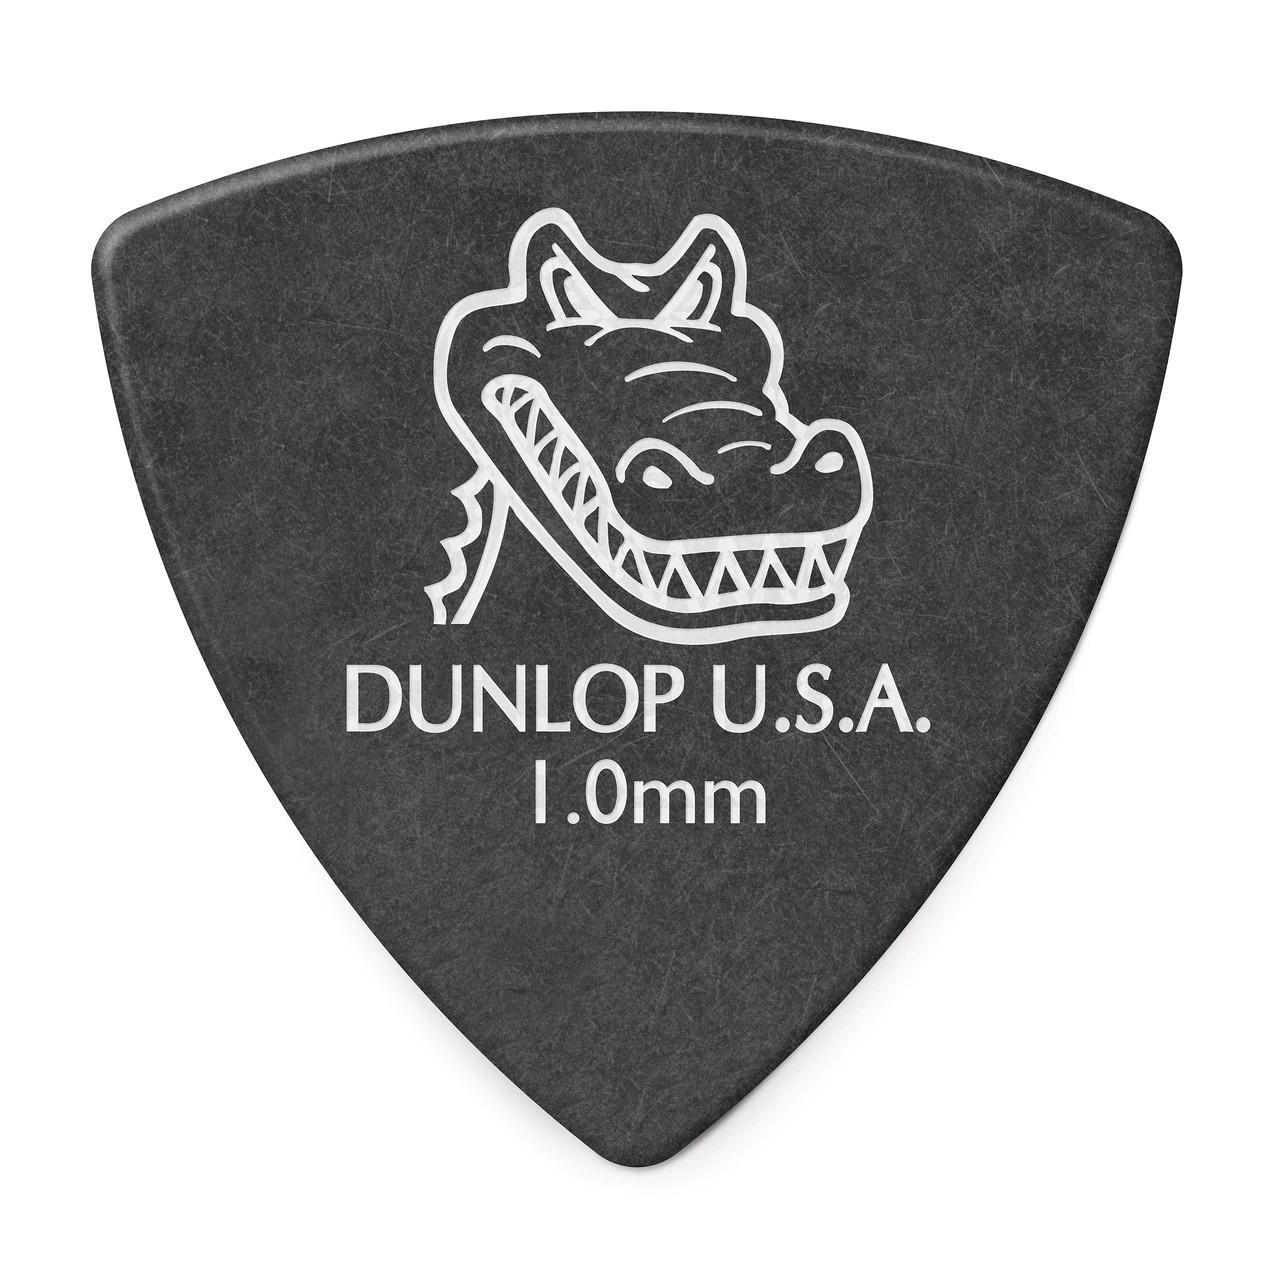 DUNLOP Médiators Gator Grip Small Triangle